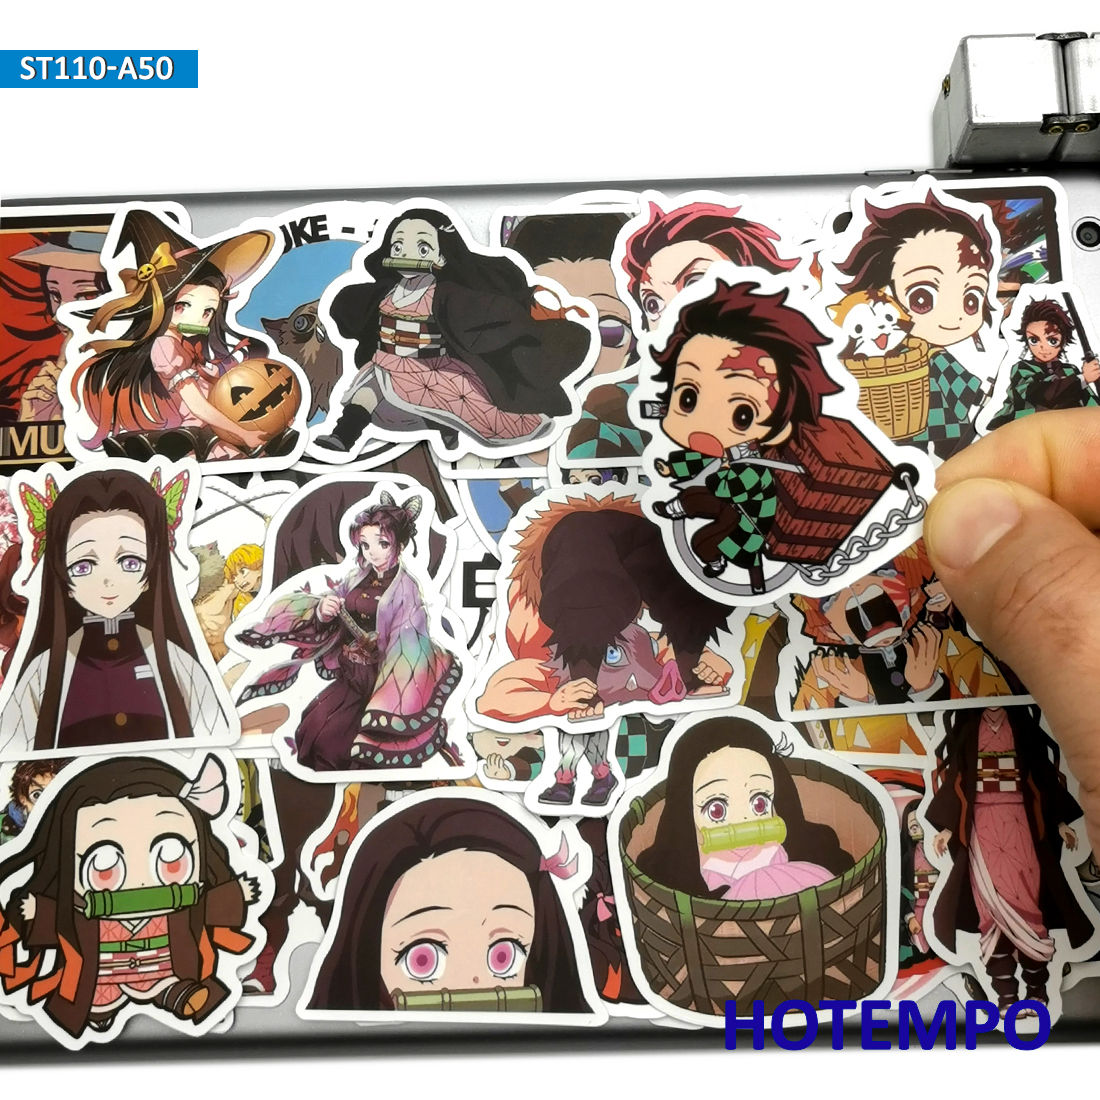 50pcs Demon Slayer Kimetsu No Yaiba Anime Cute Stickers Toys For Mobile Phone Laptop Suitcase Skateboard Cartoon Decal Stickers